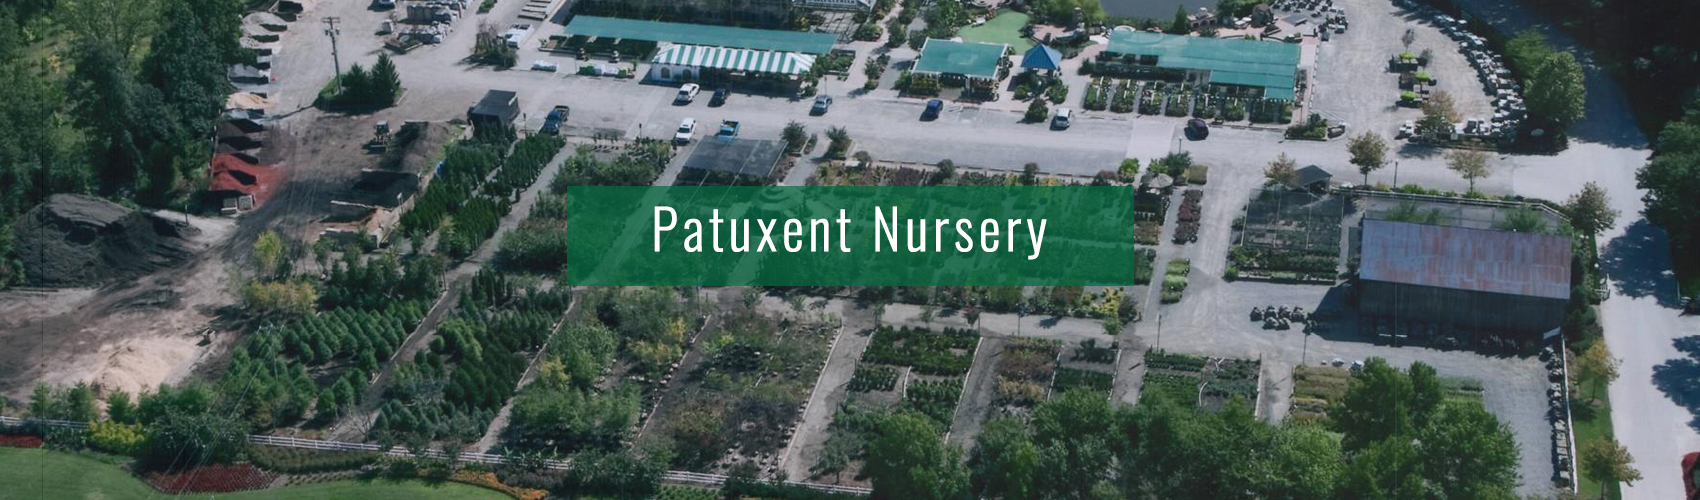 Garden Center And Plant Nursery In Bowie